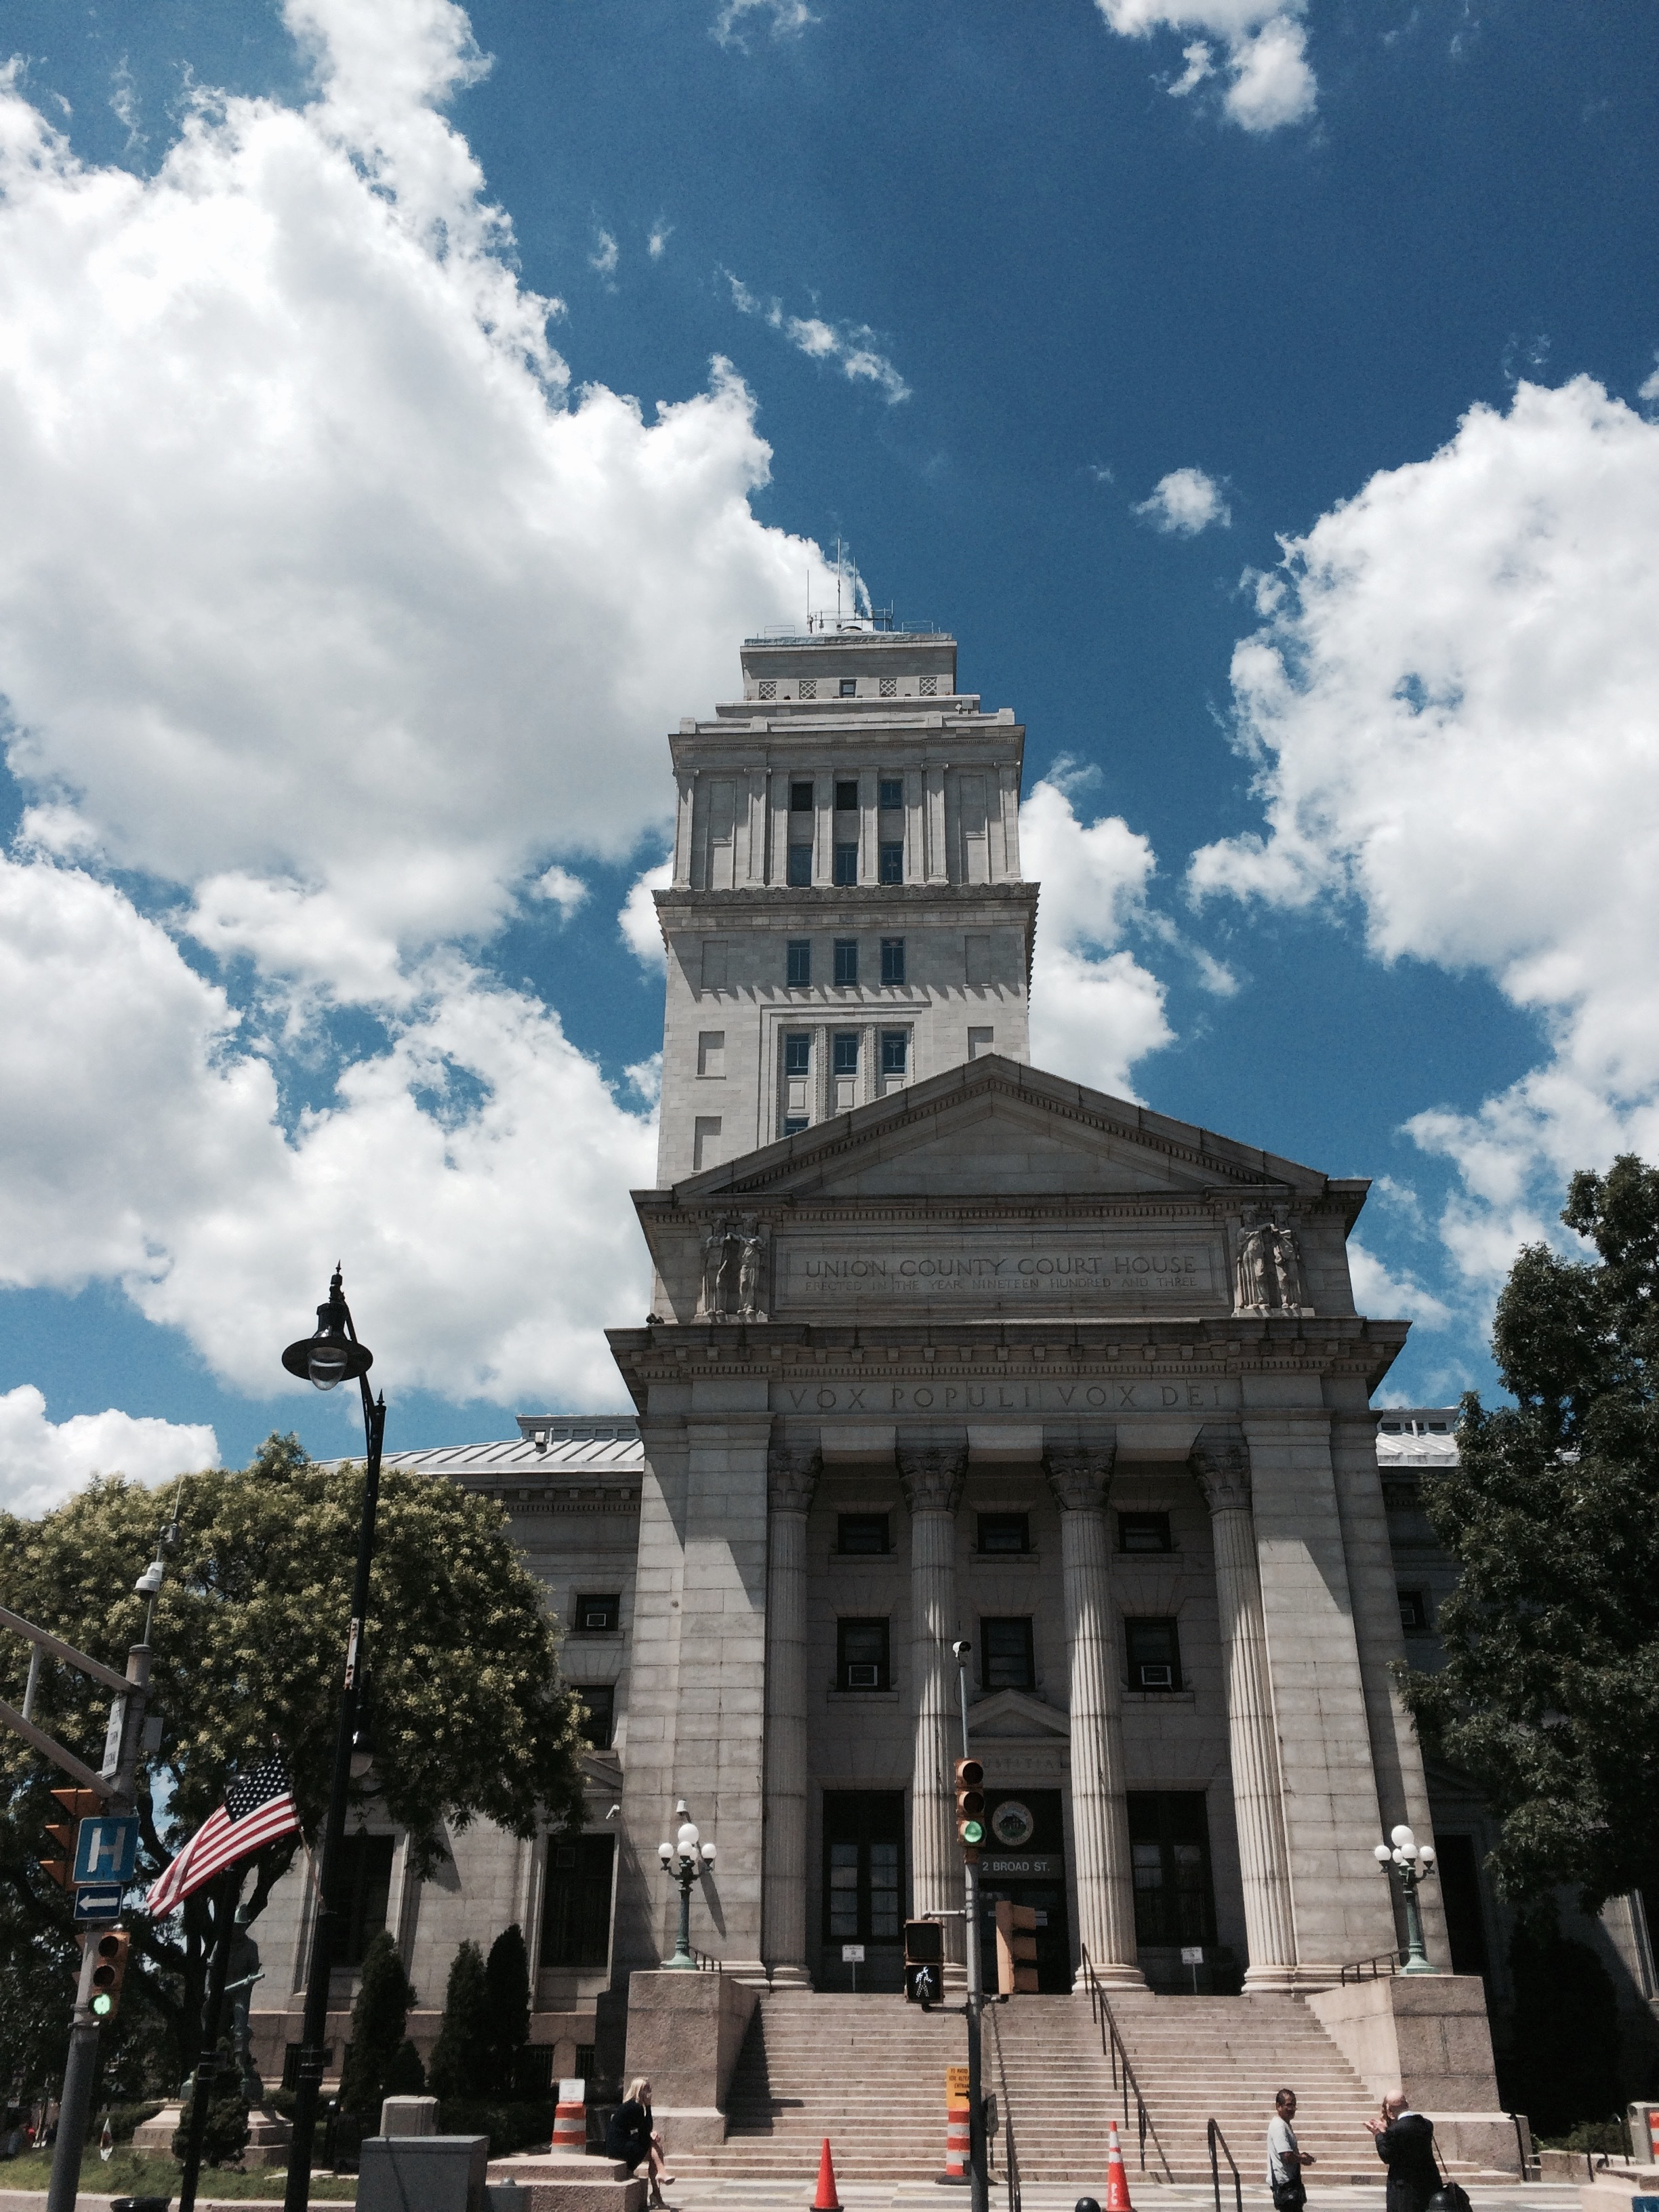 01339e9ac3db3db0c8fb_Union_County_Courthouse_August_2015.jpg